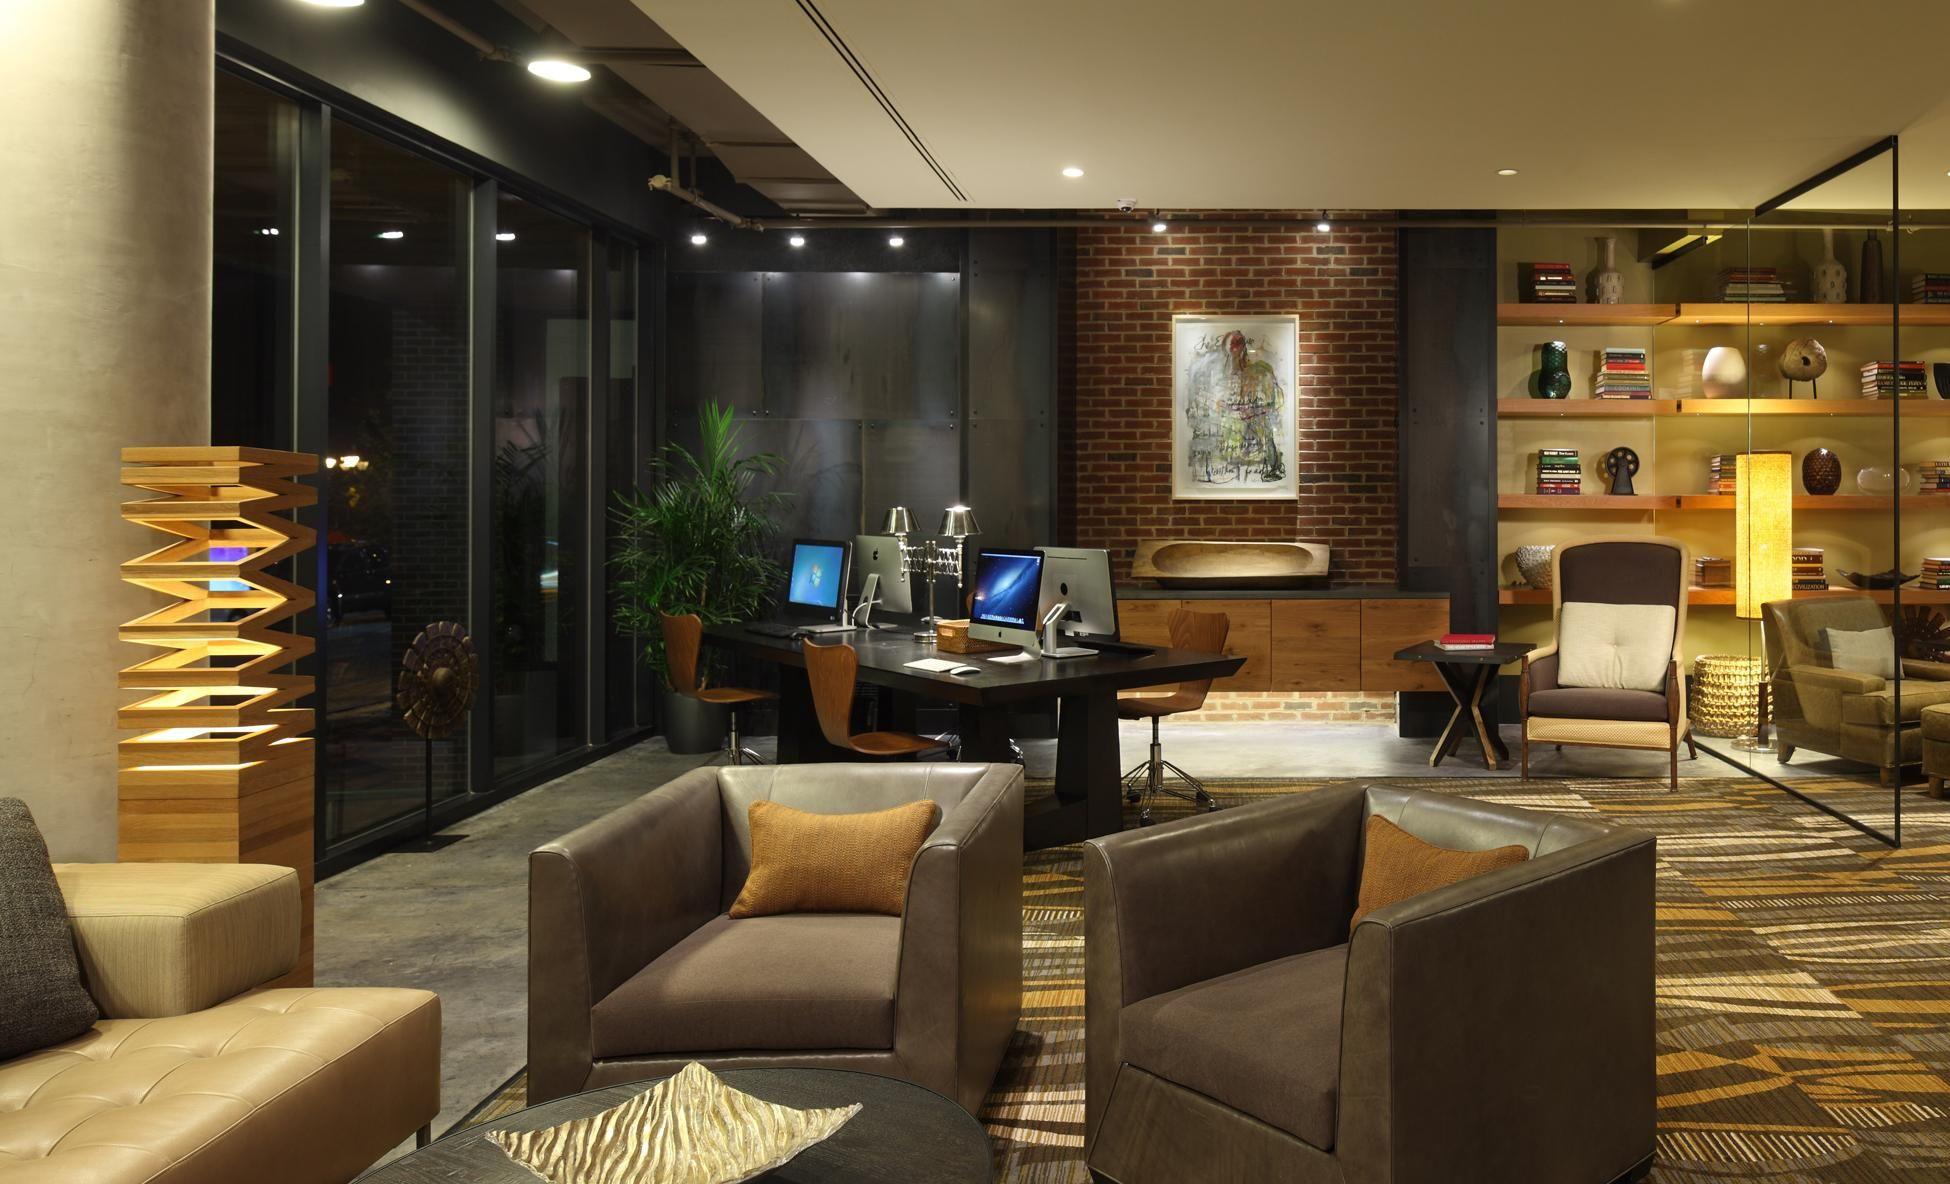 Rental Apartments Baltimore Maryland Union Wharf Fells Point Apartment Interior Apartment Luxury Apartments